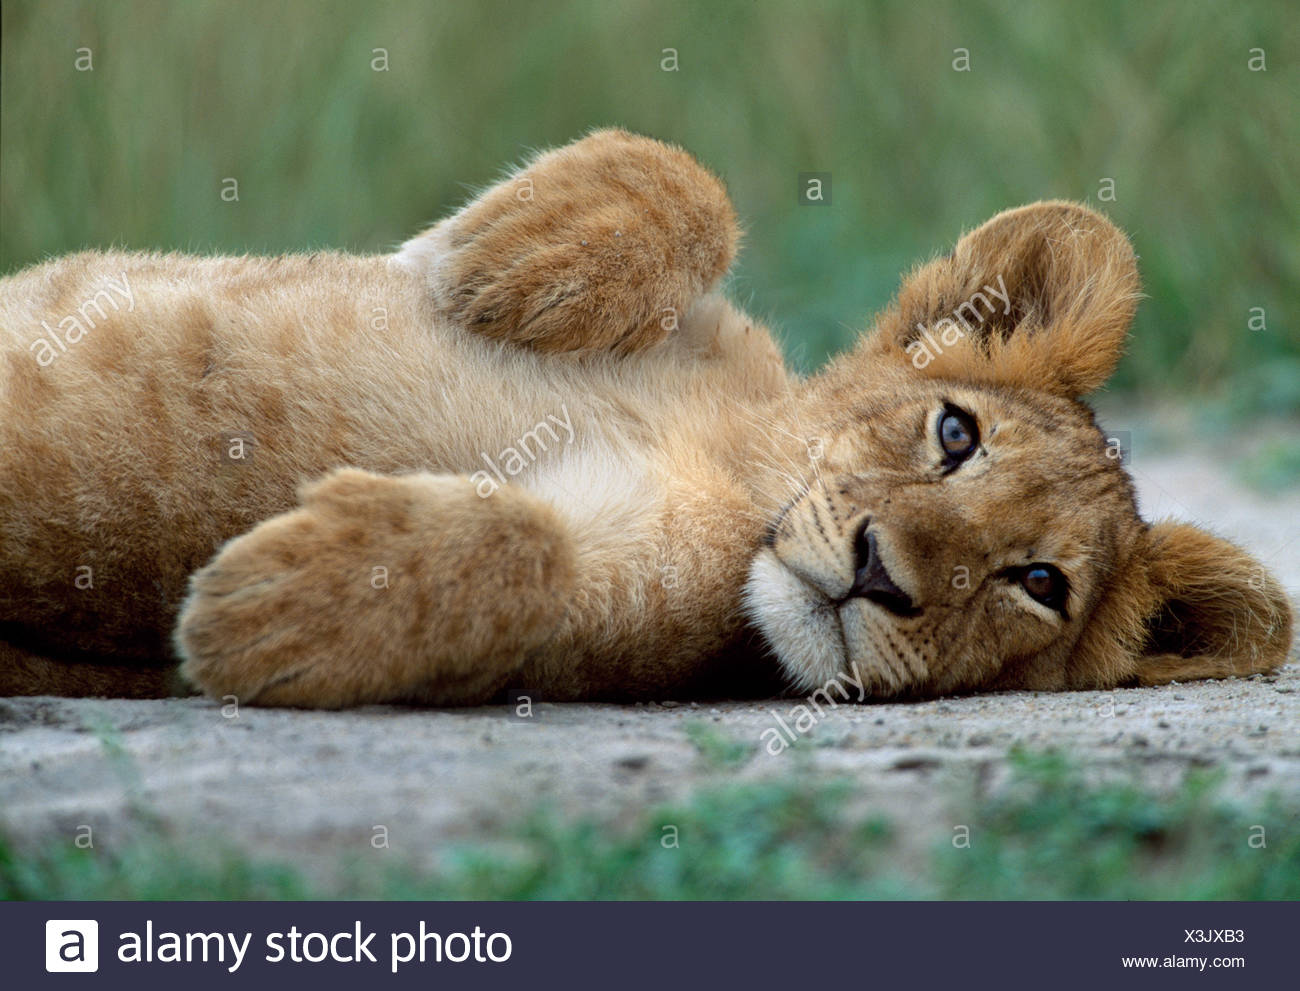 Lion cub, Queen Elizabeth Park, Uganda - Stock Image